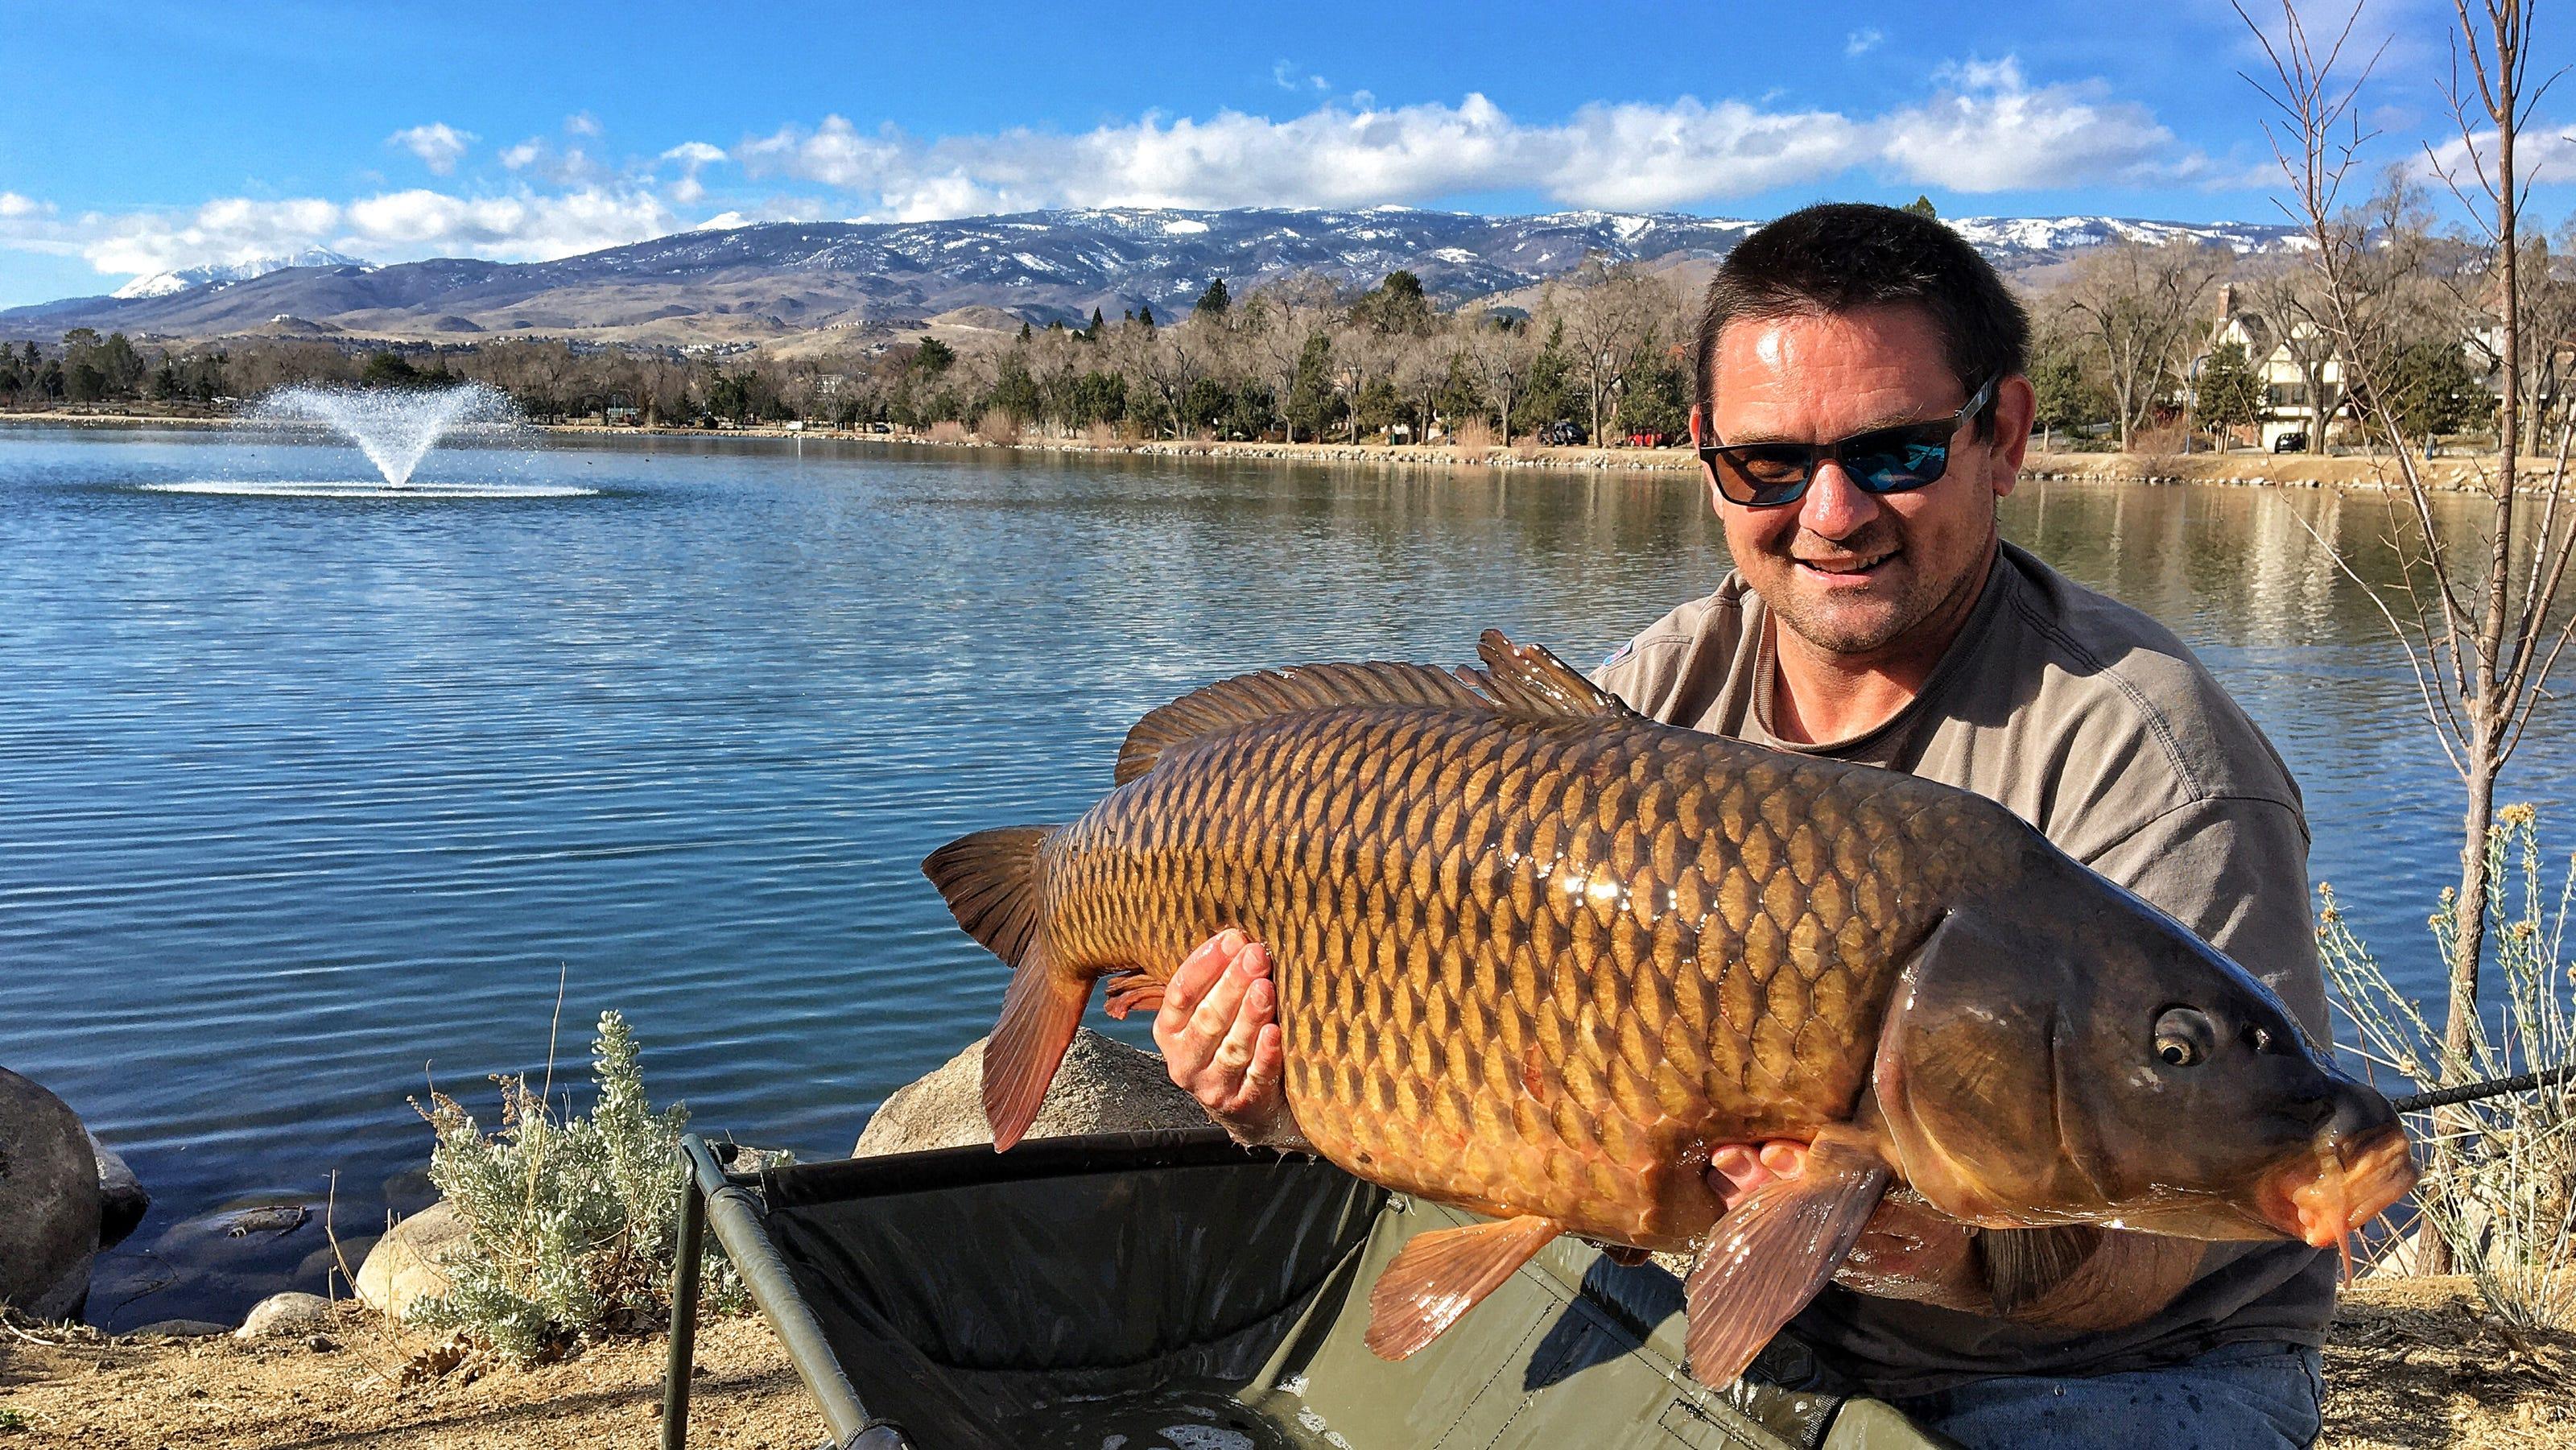 Angler Lands Record Carp From Virginia Lake In Reno